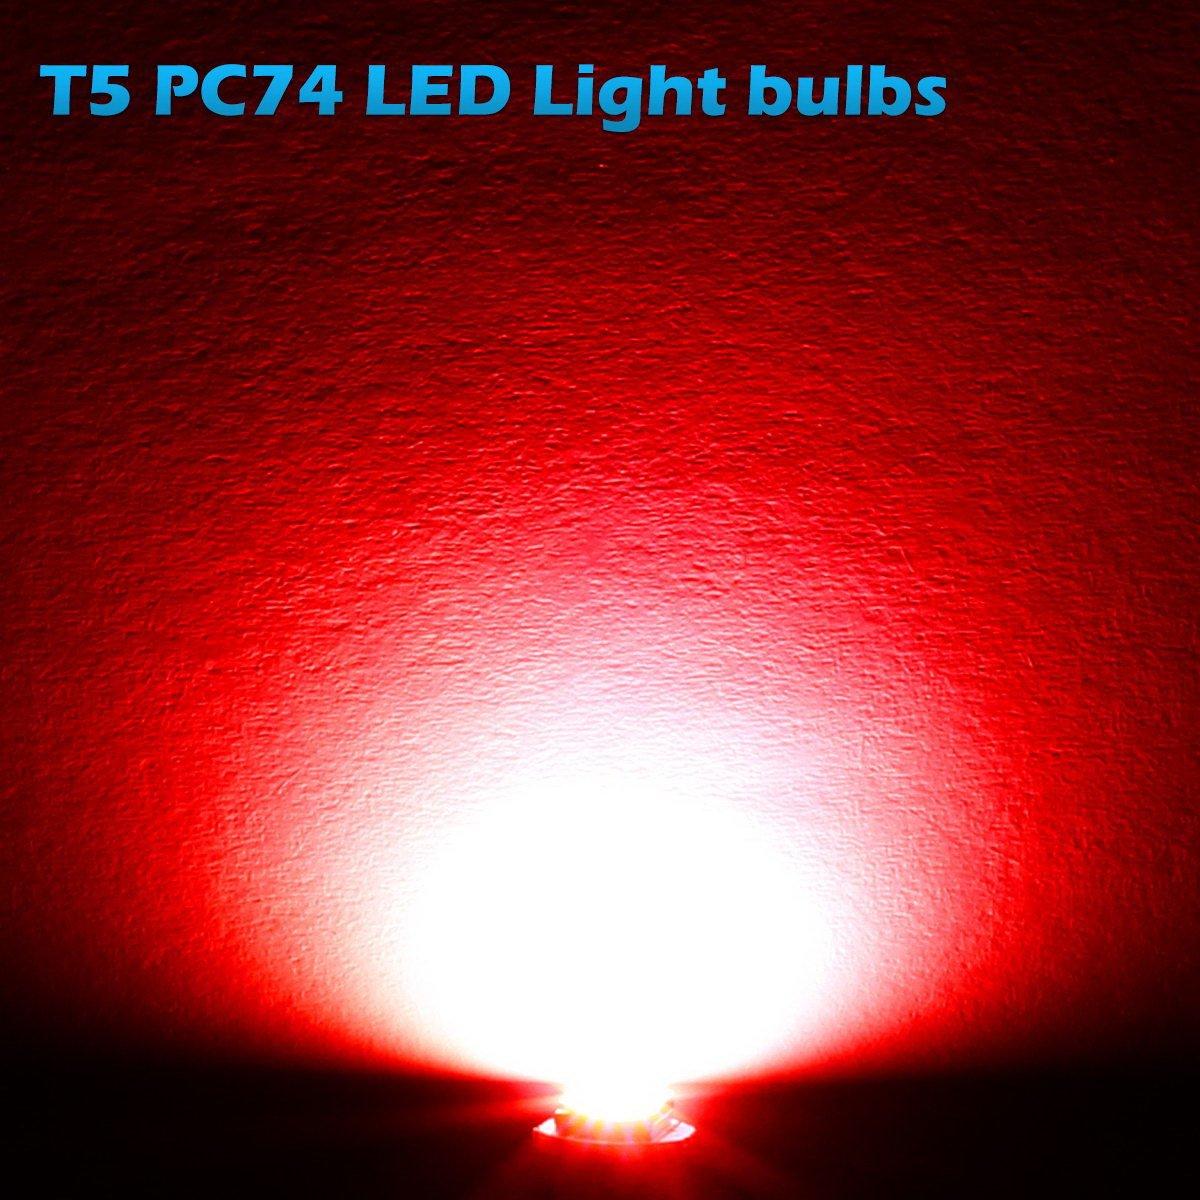 Partsam 10x Red T5 1 SMD 5050 Dashboard Wedge Car LED Light Bulb Lamp 37 73 74 79 for 1993-1997 Honda Civic del Sol